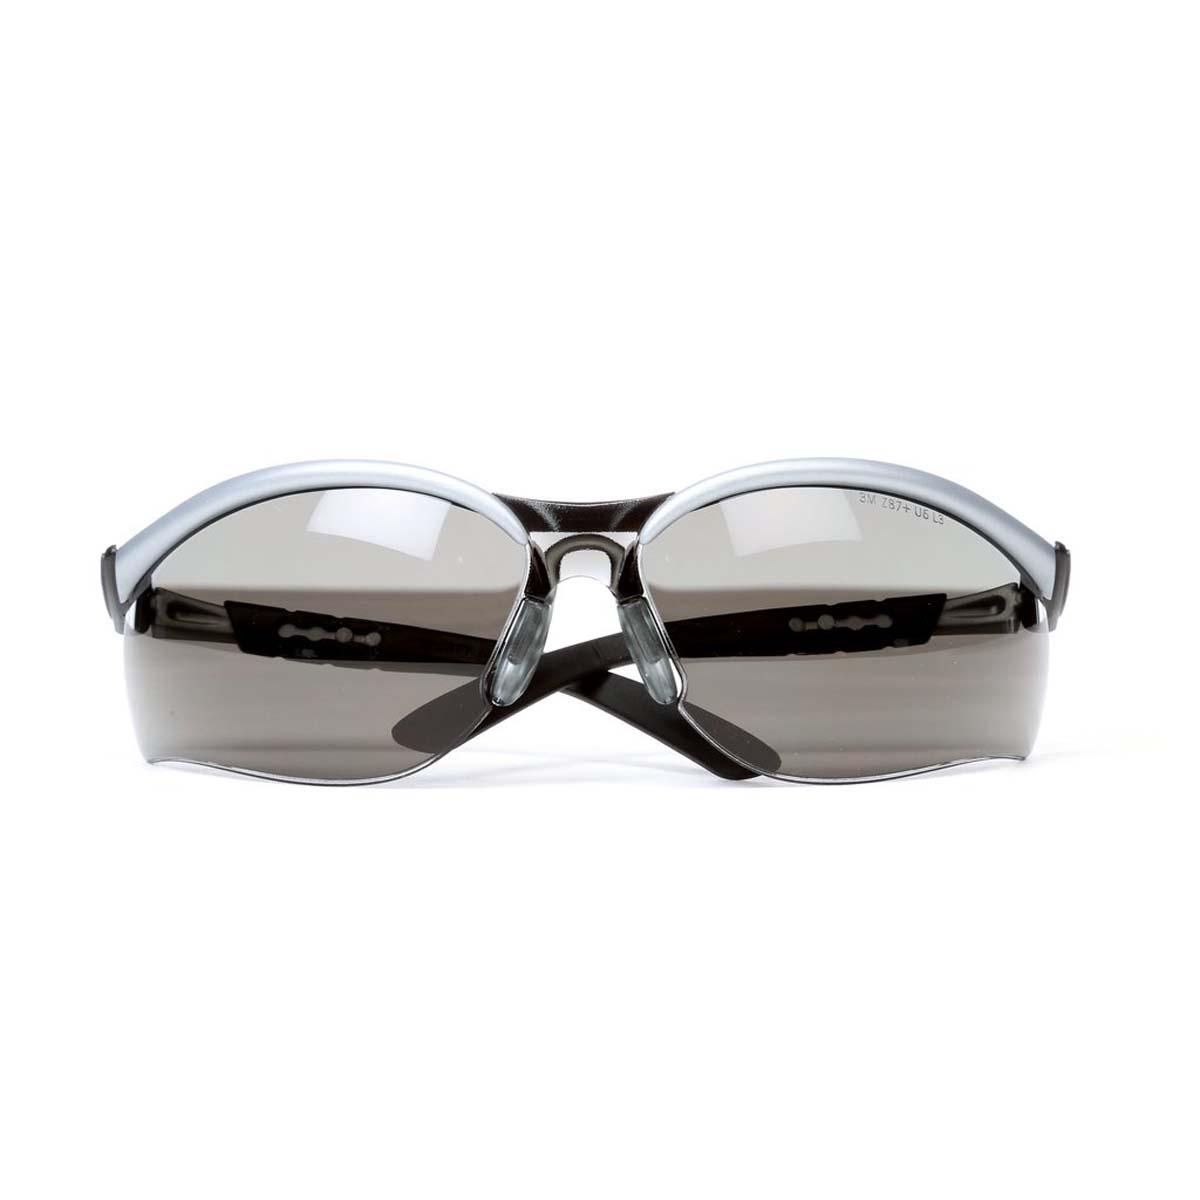 "3Mâ""¢ BXâ""¢ Protective Eyewear 11381-00000-20 Gray Anti-Fog Lens, Silver/Black Frame"